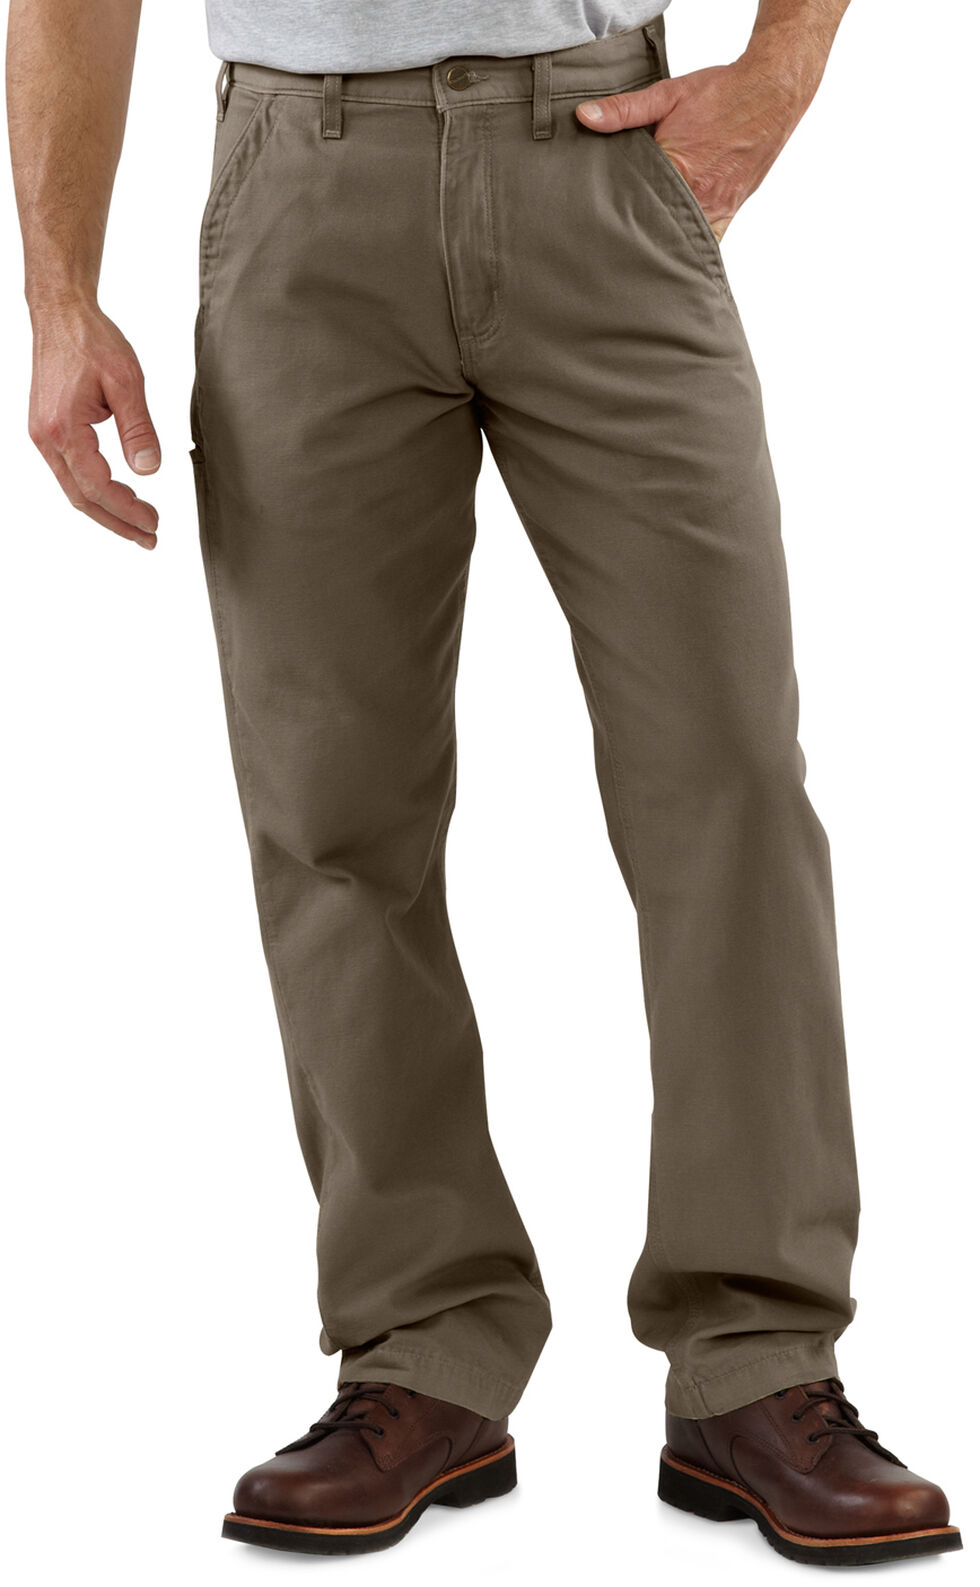 Carhartt Khaki Canvas Work Pants, Mushroom, hi-res